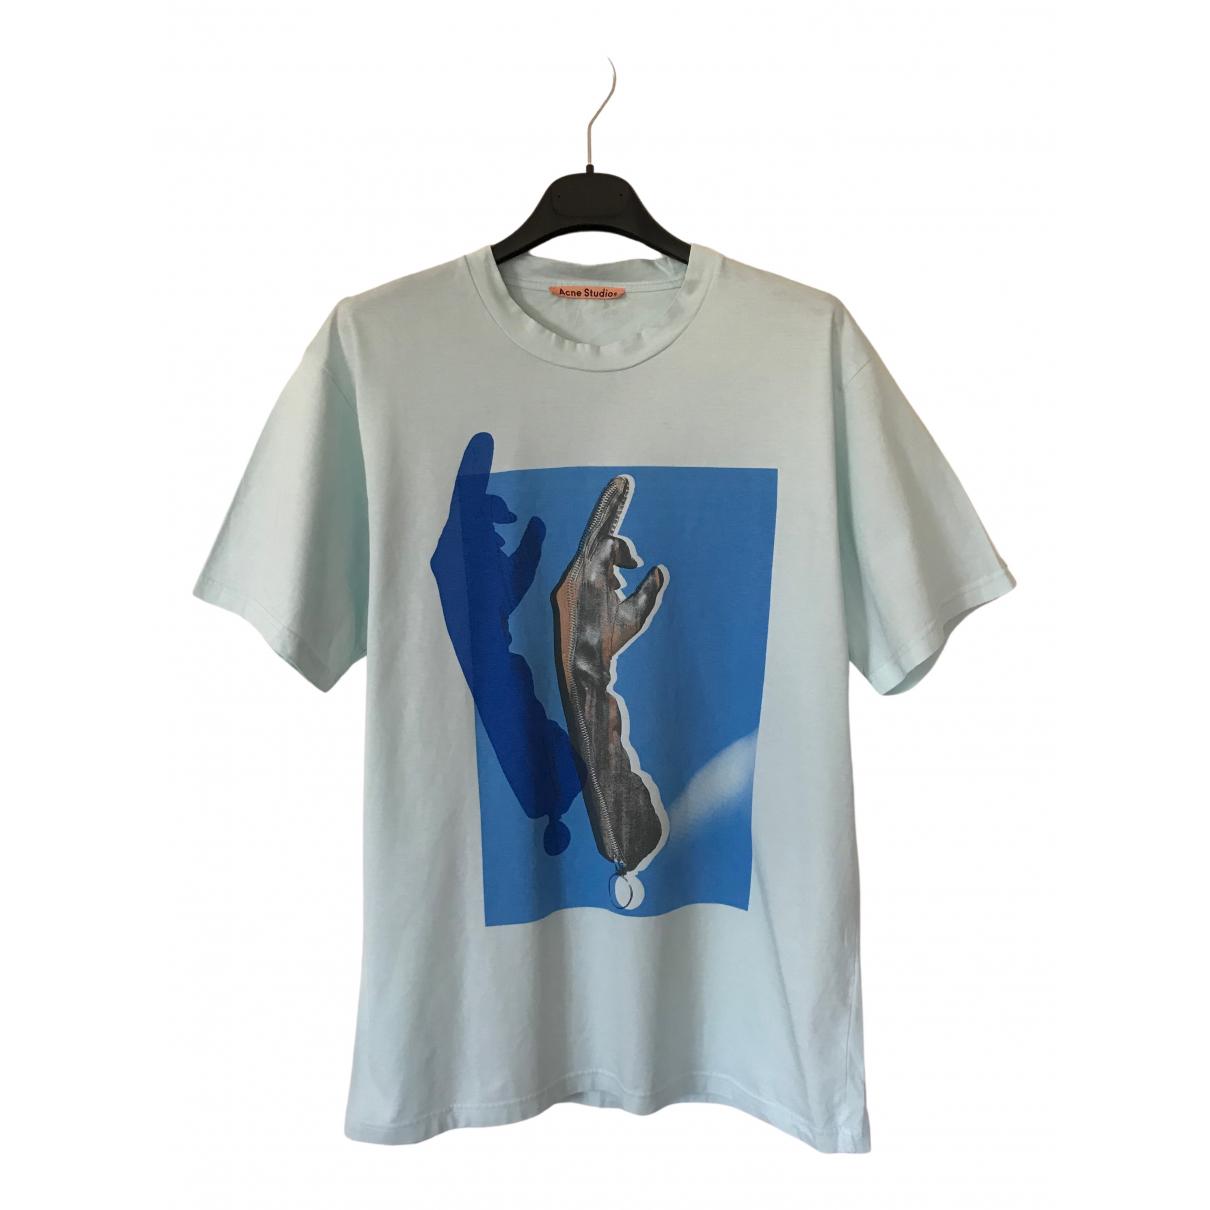 Acne Studios - Tee shirts   pour homme en coton - bleu